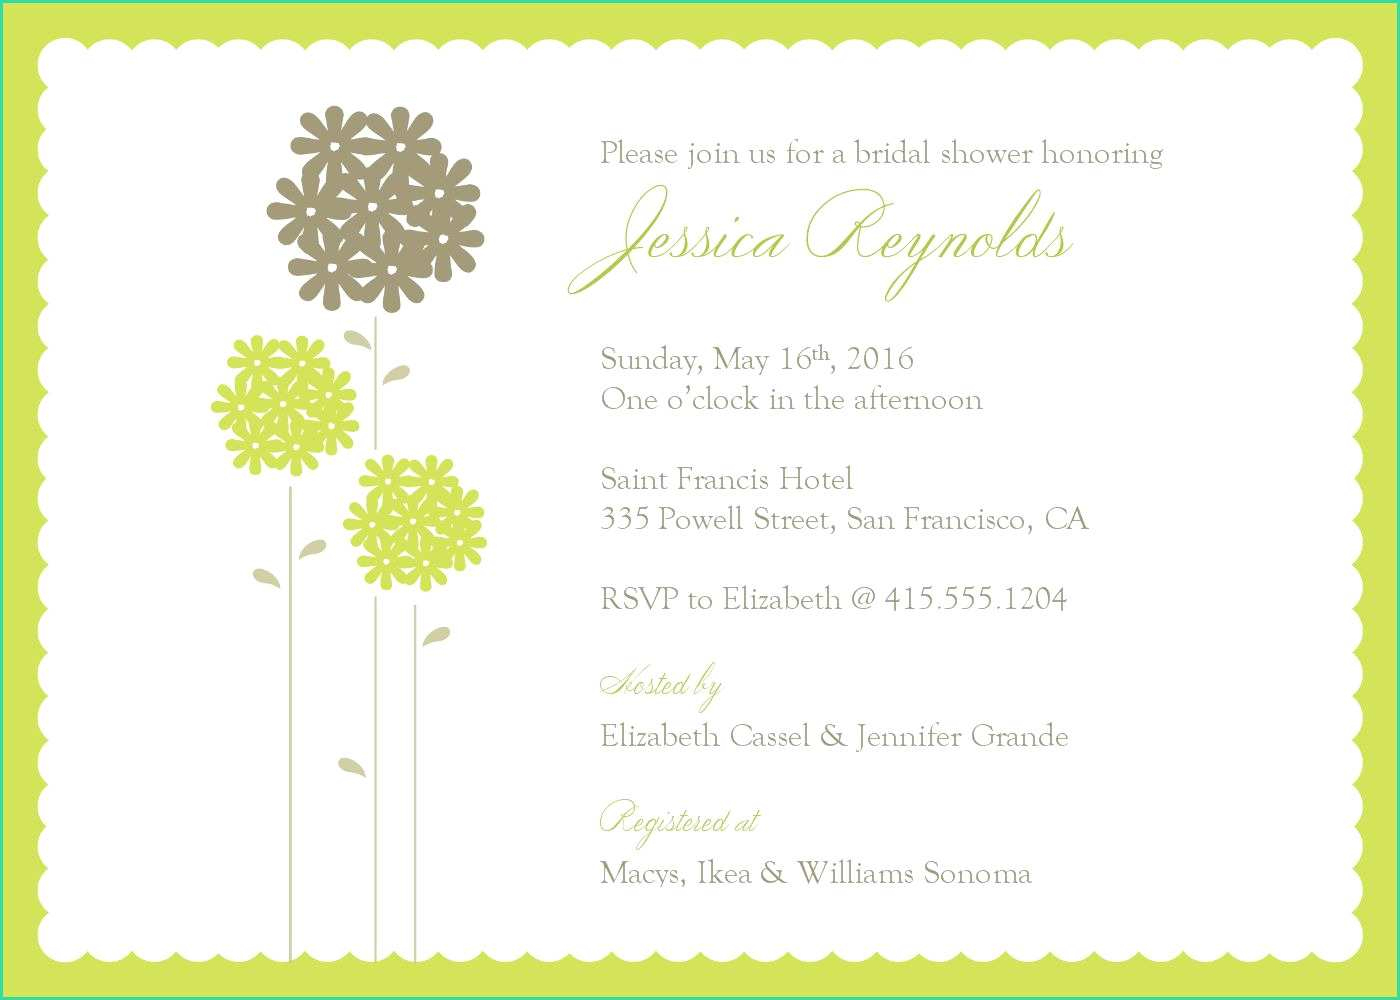 Updated Free Printable Wedding Invitation Templates For Word With - Free Printable Wedding Invitation Templates For Word